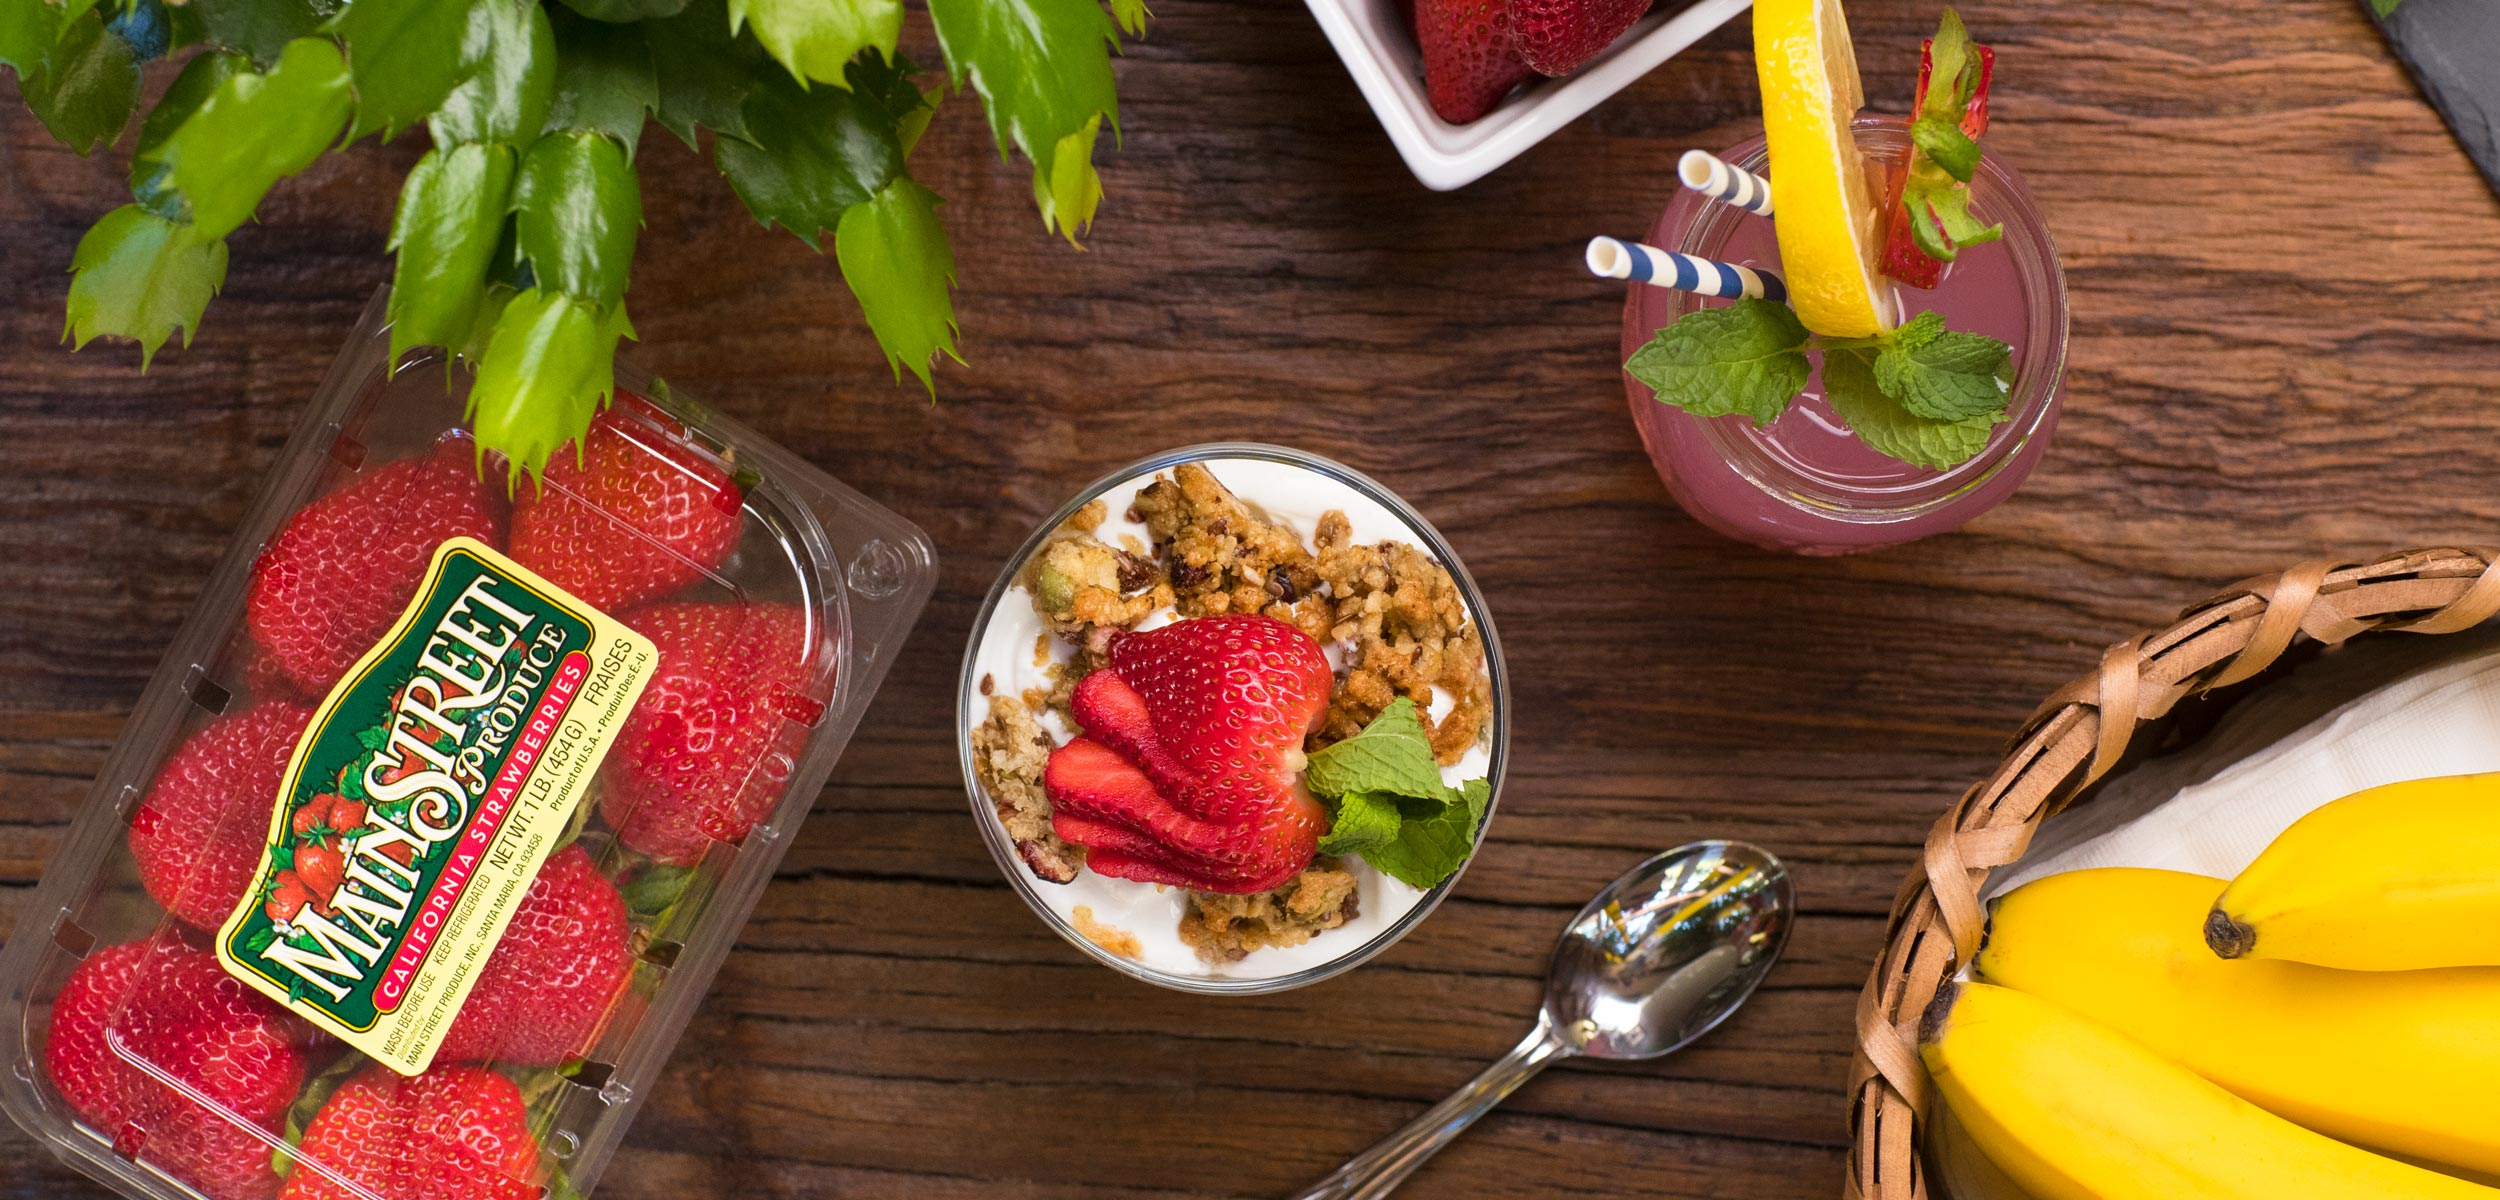 Main-Street-Produce-Strawberries-Lifestyle